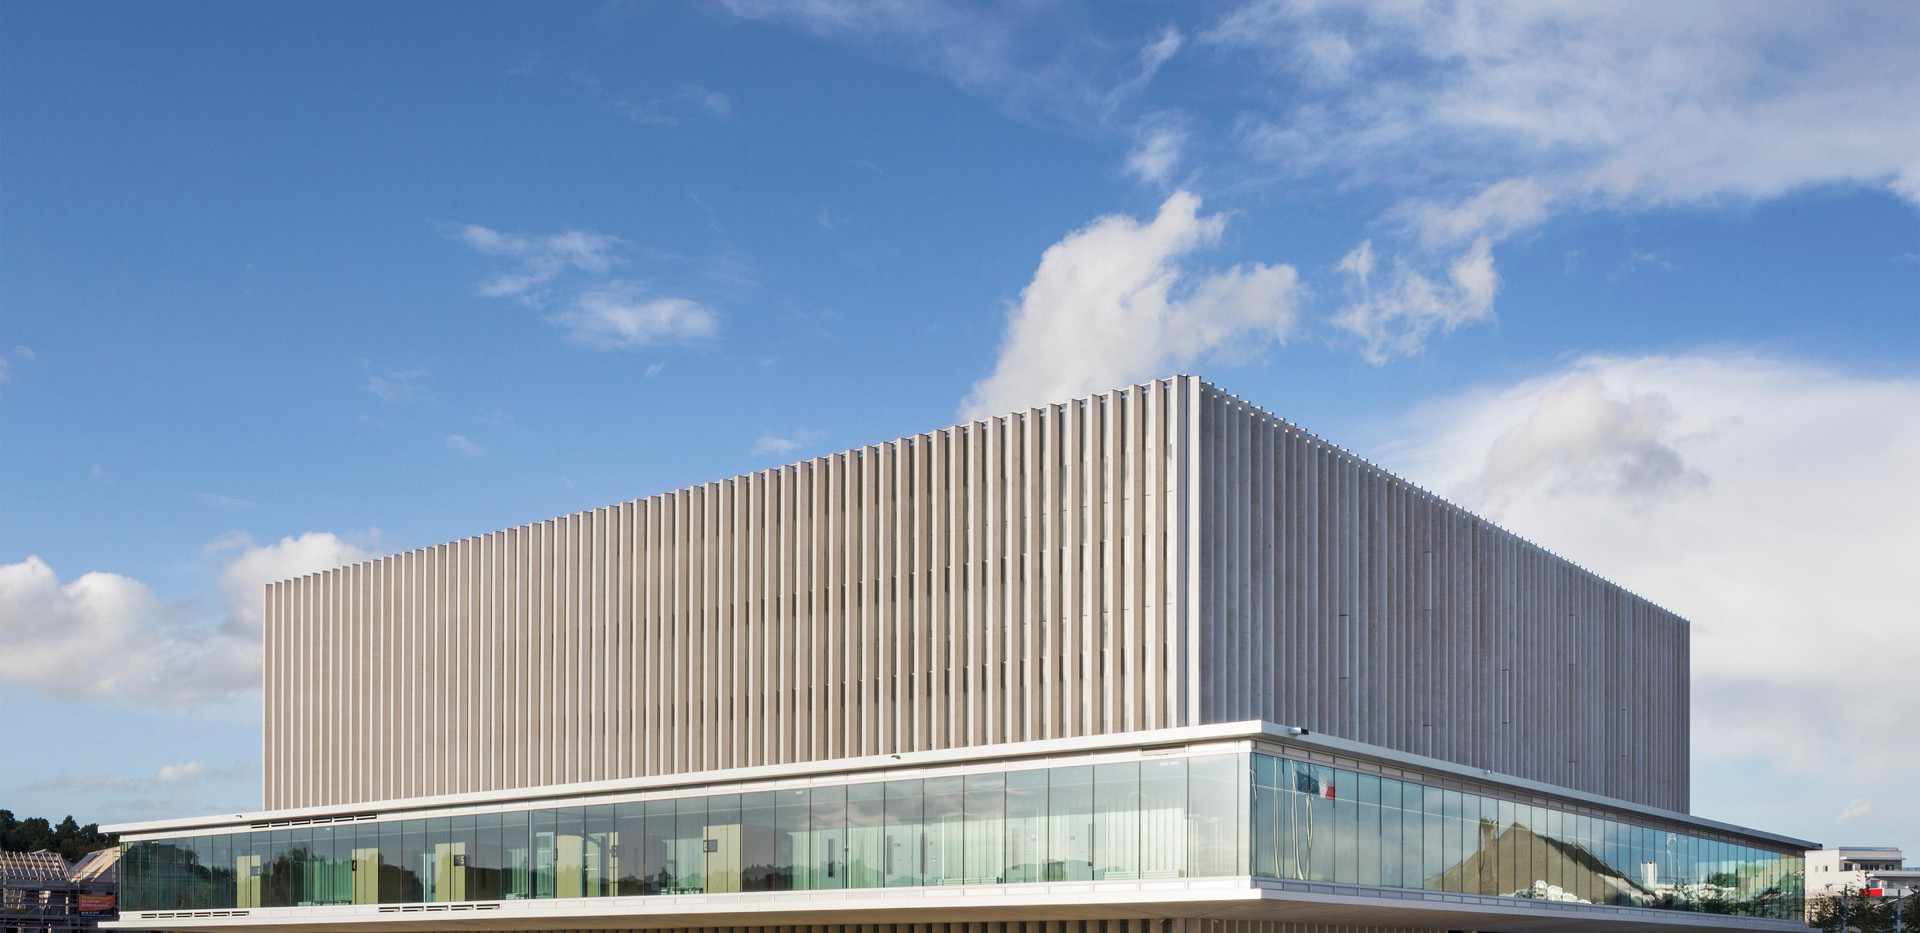 A Palais de justice Caen 001 EH autorisi